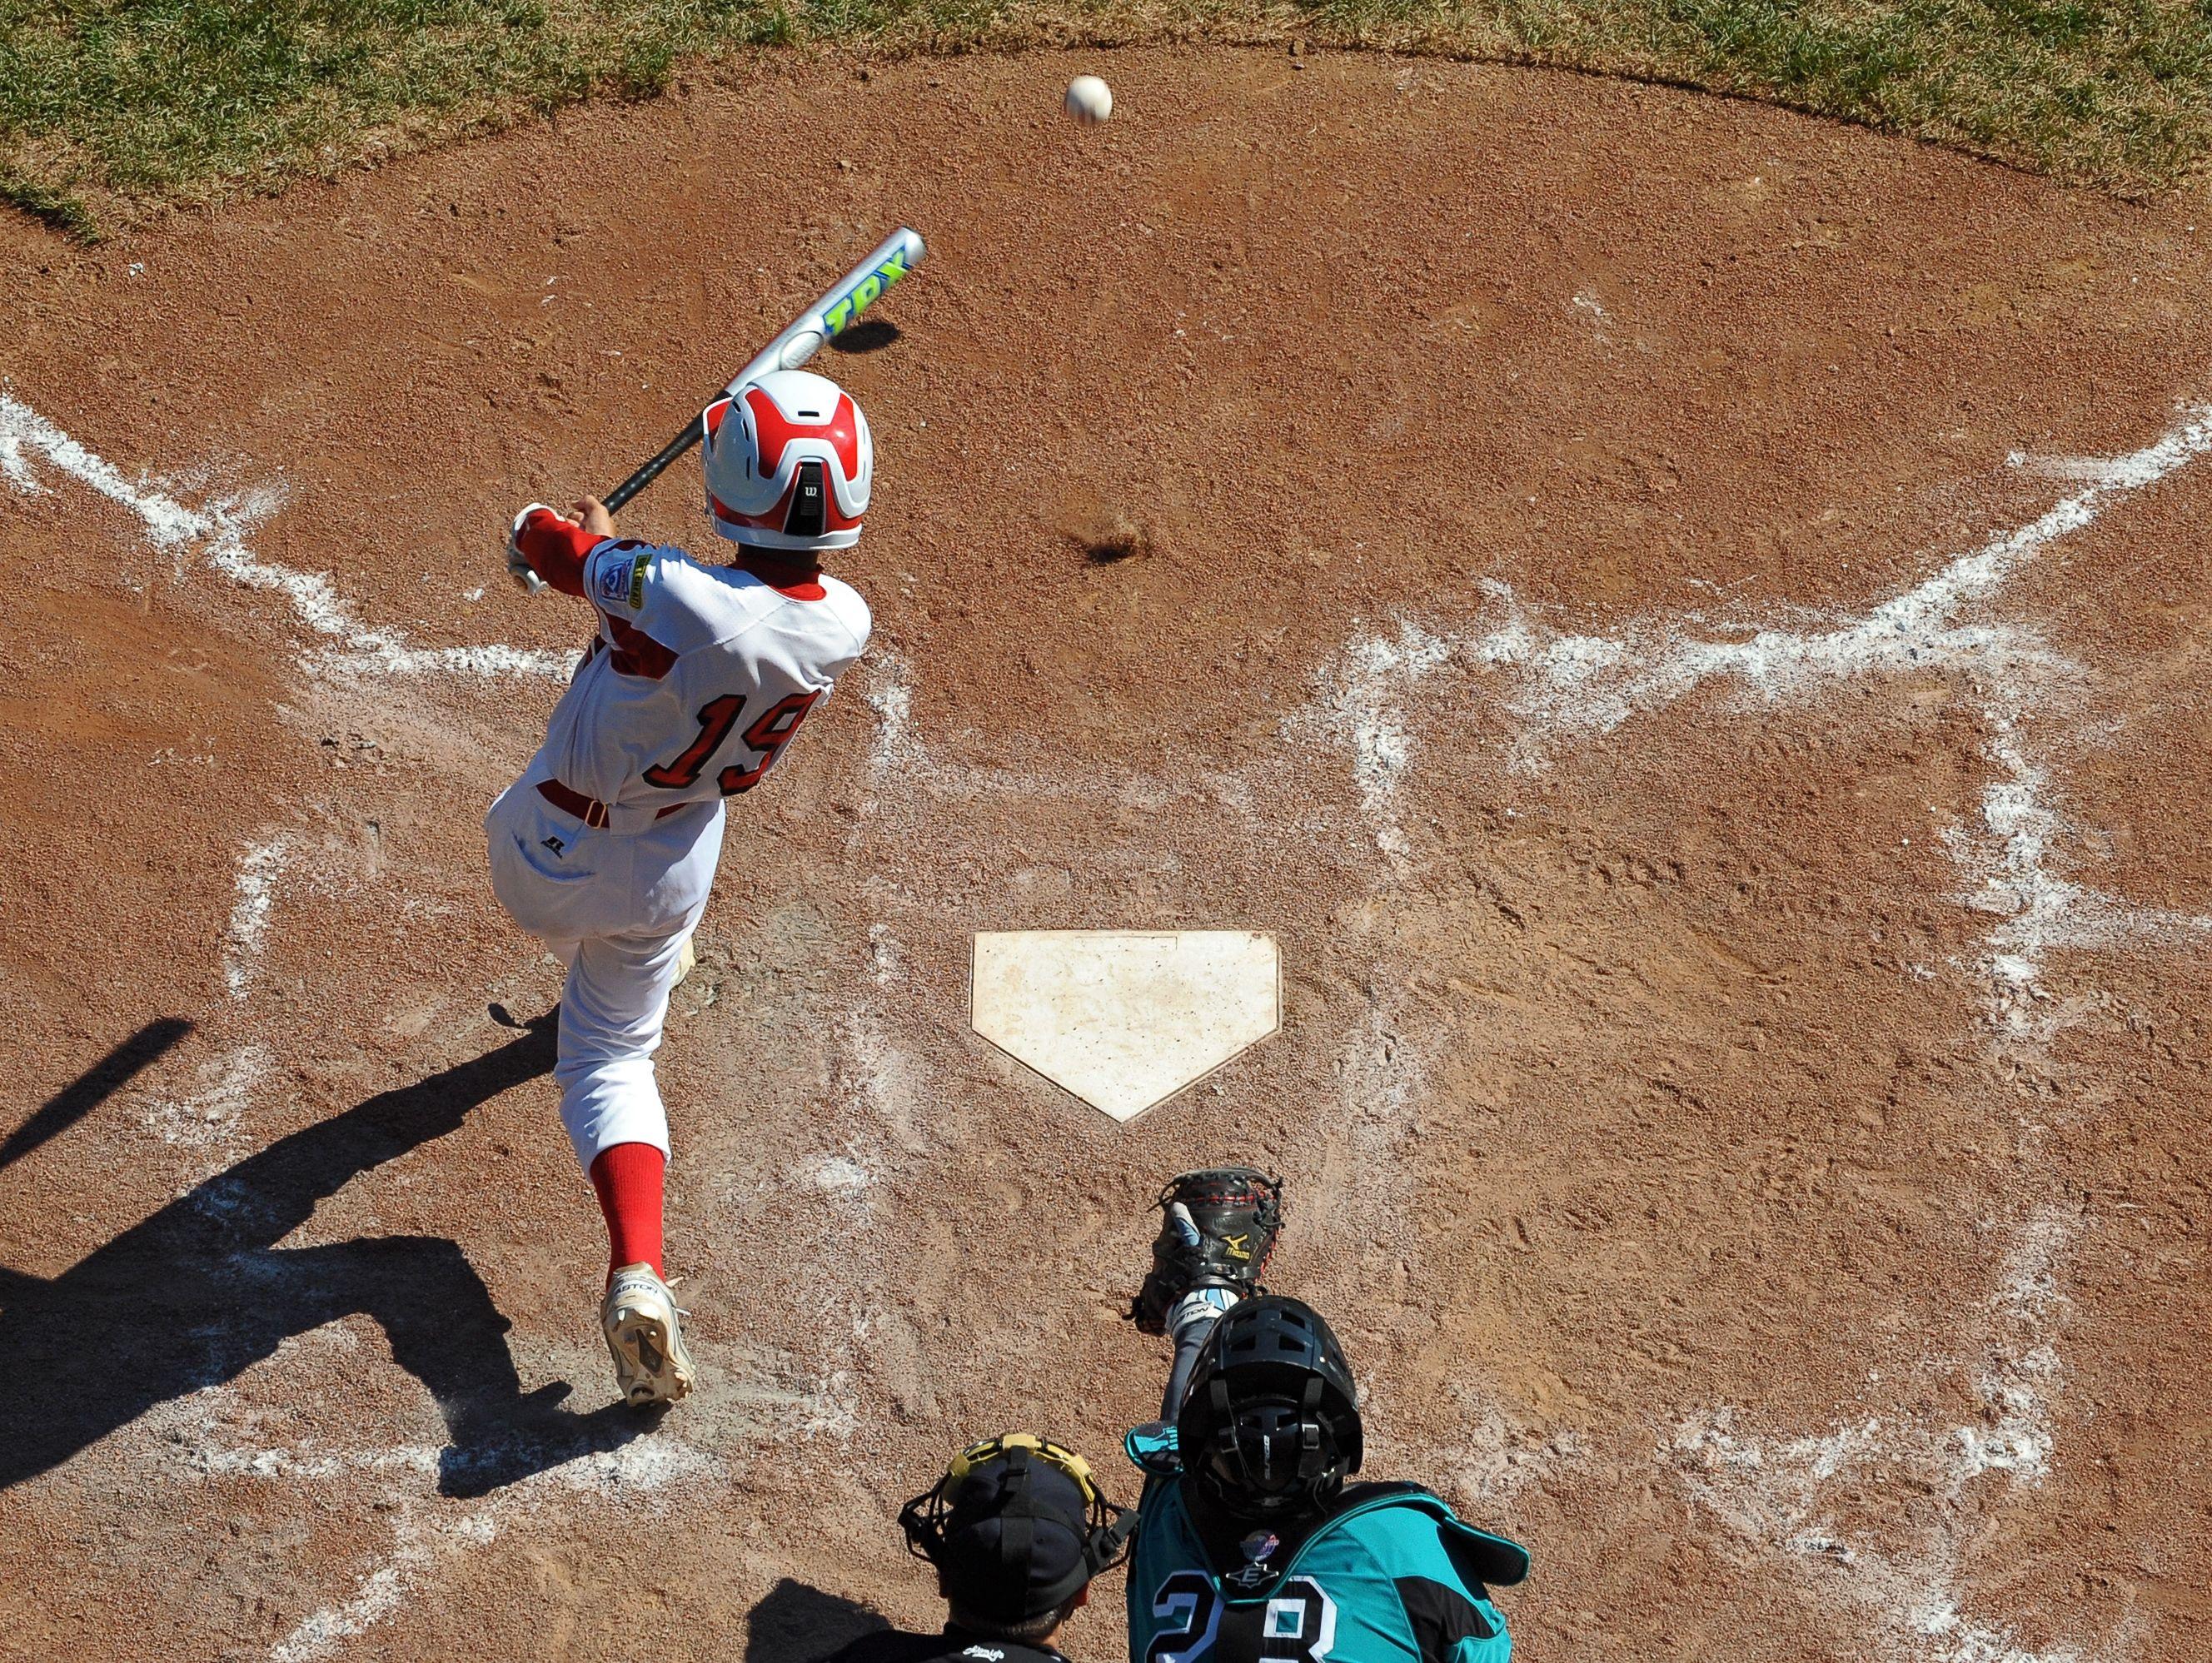 The Little League World Series